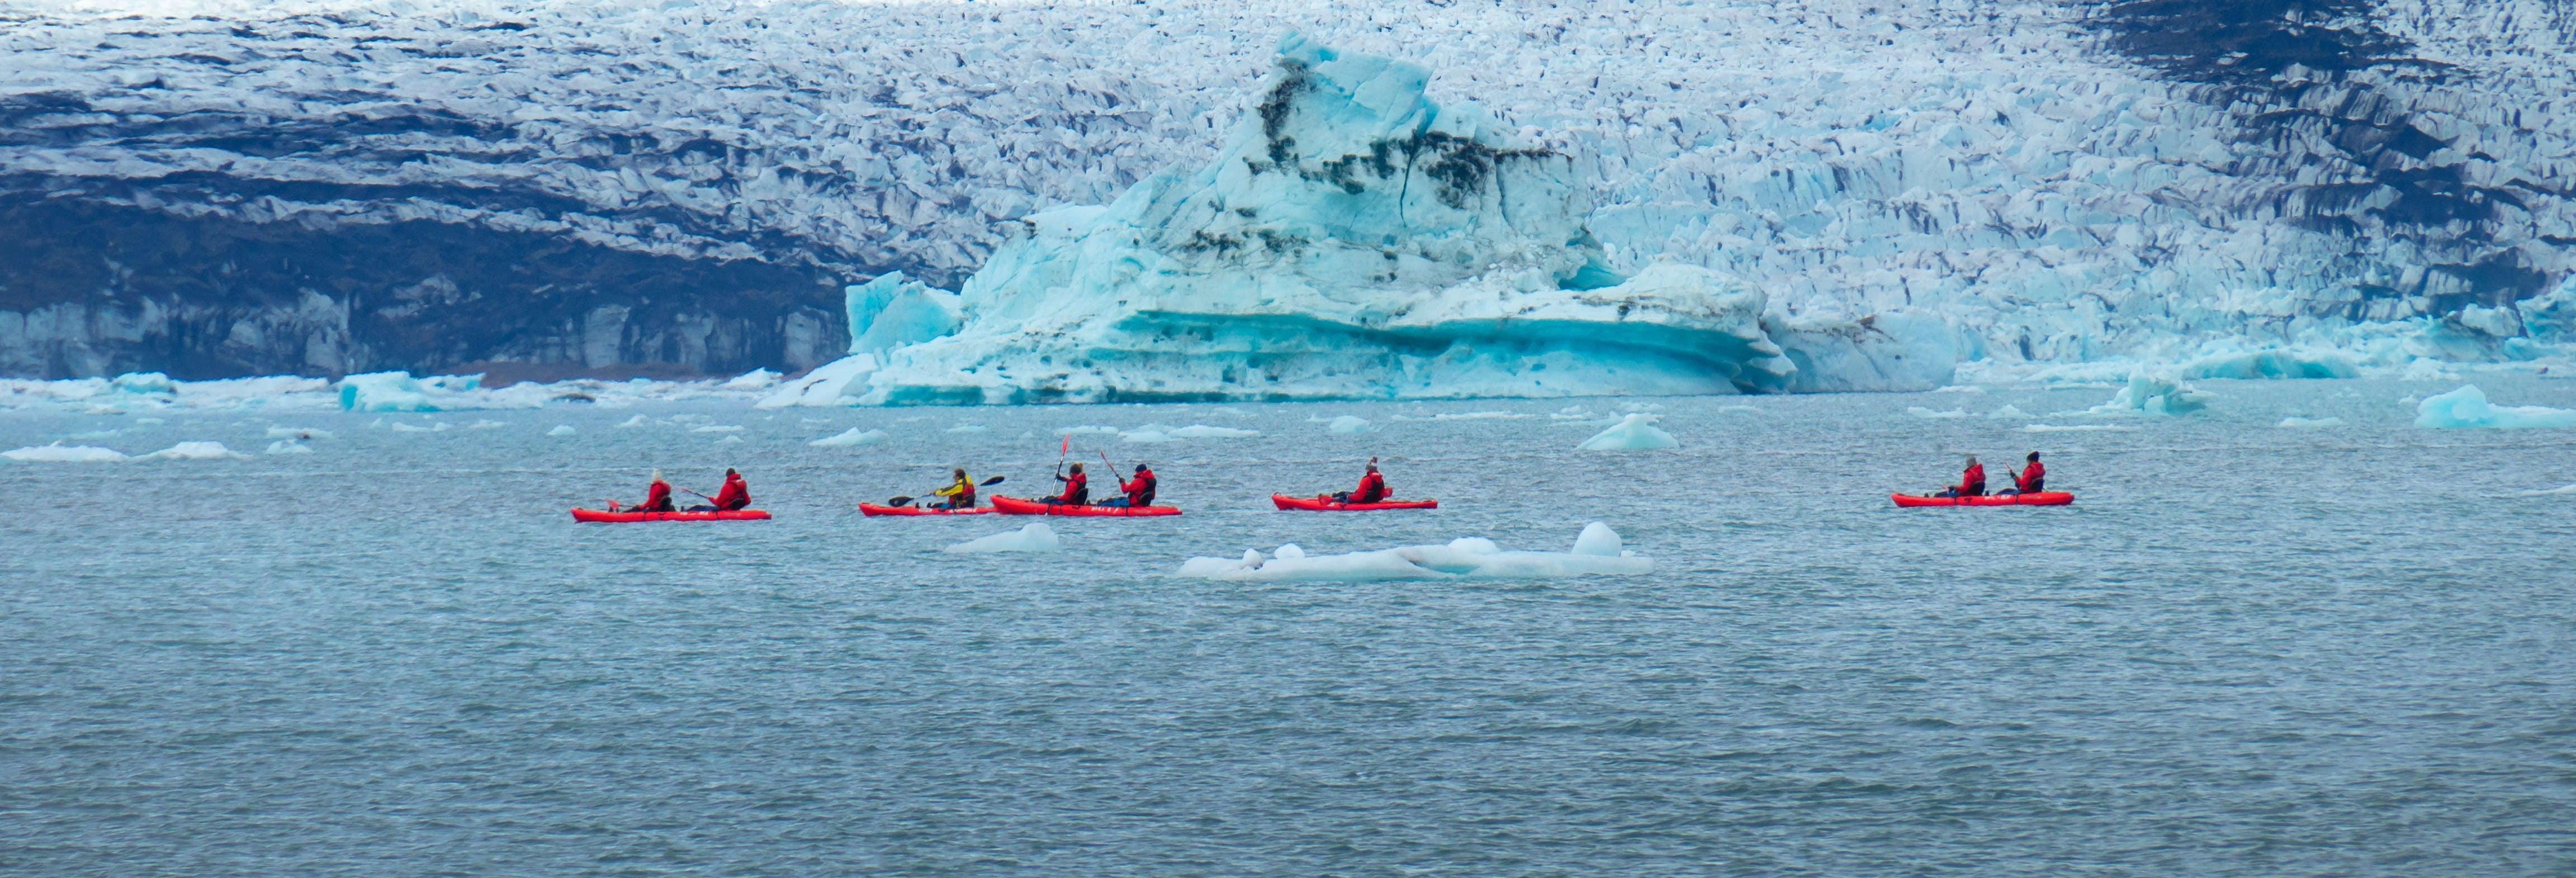 Jökulsárlón Glacier Kayak Tour